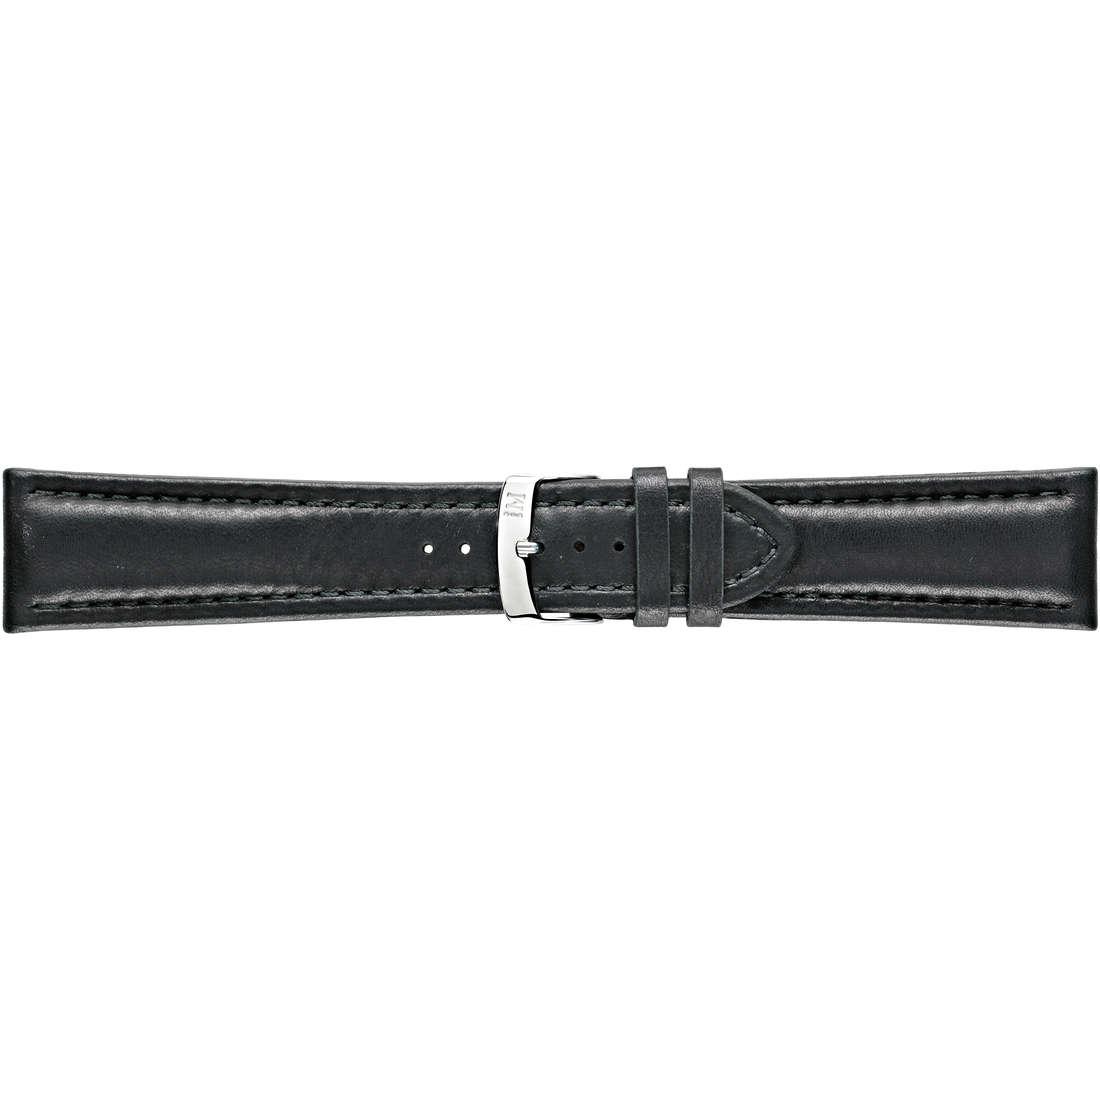 watch watch bands watch straps man Morellato Morellato 1930 A01U4026A37019CR26